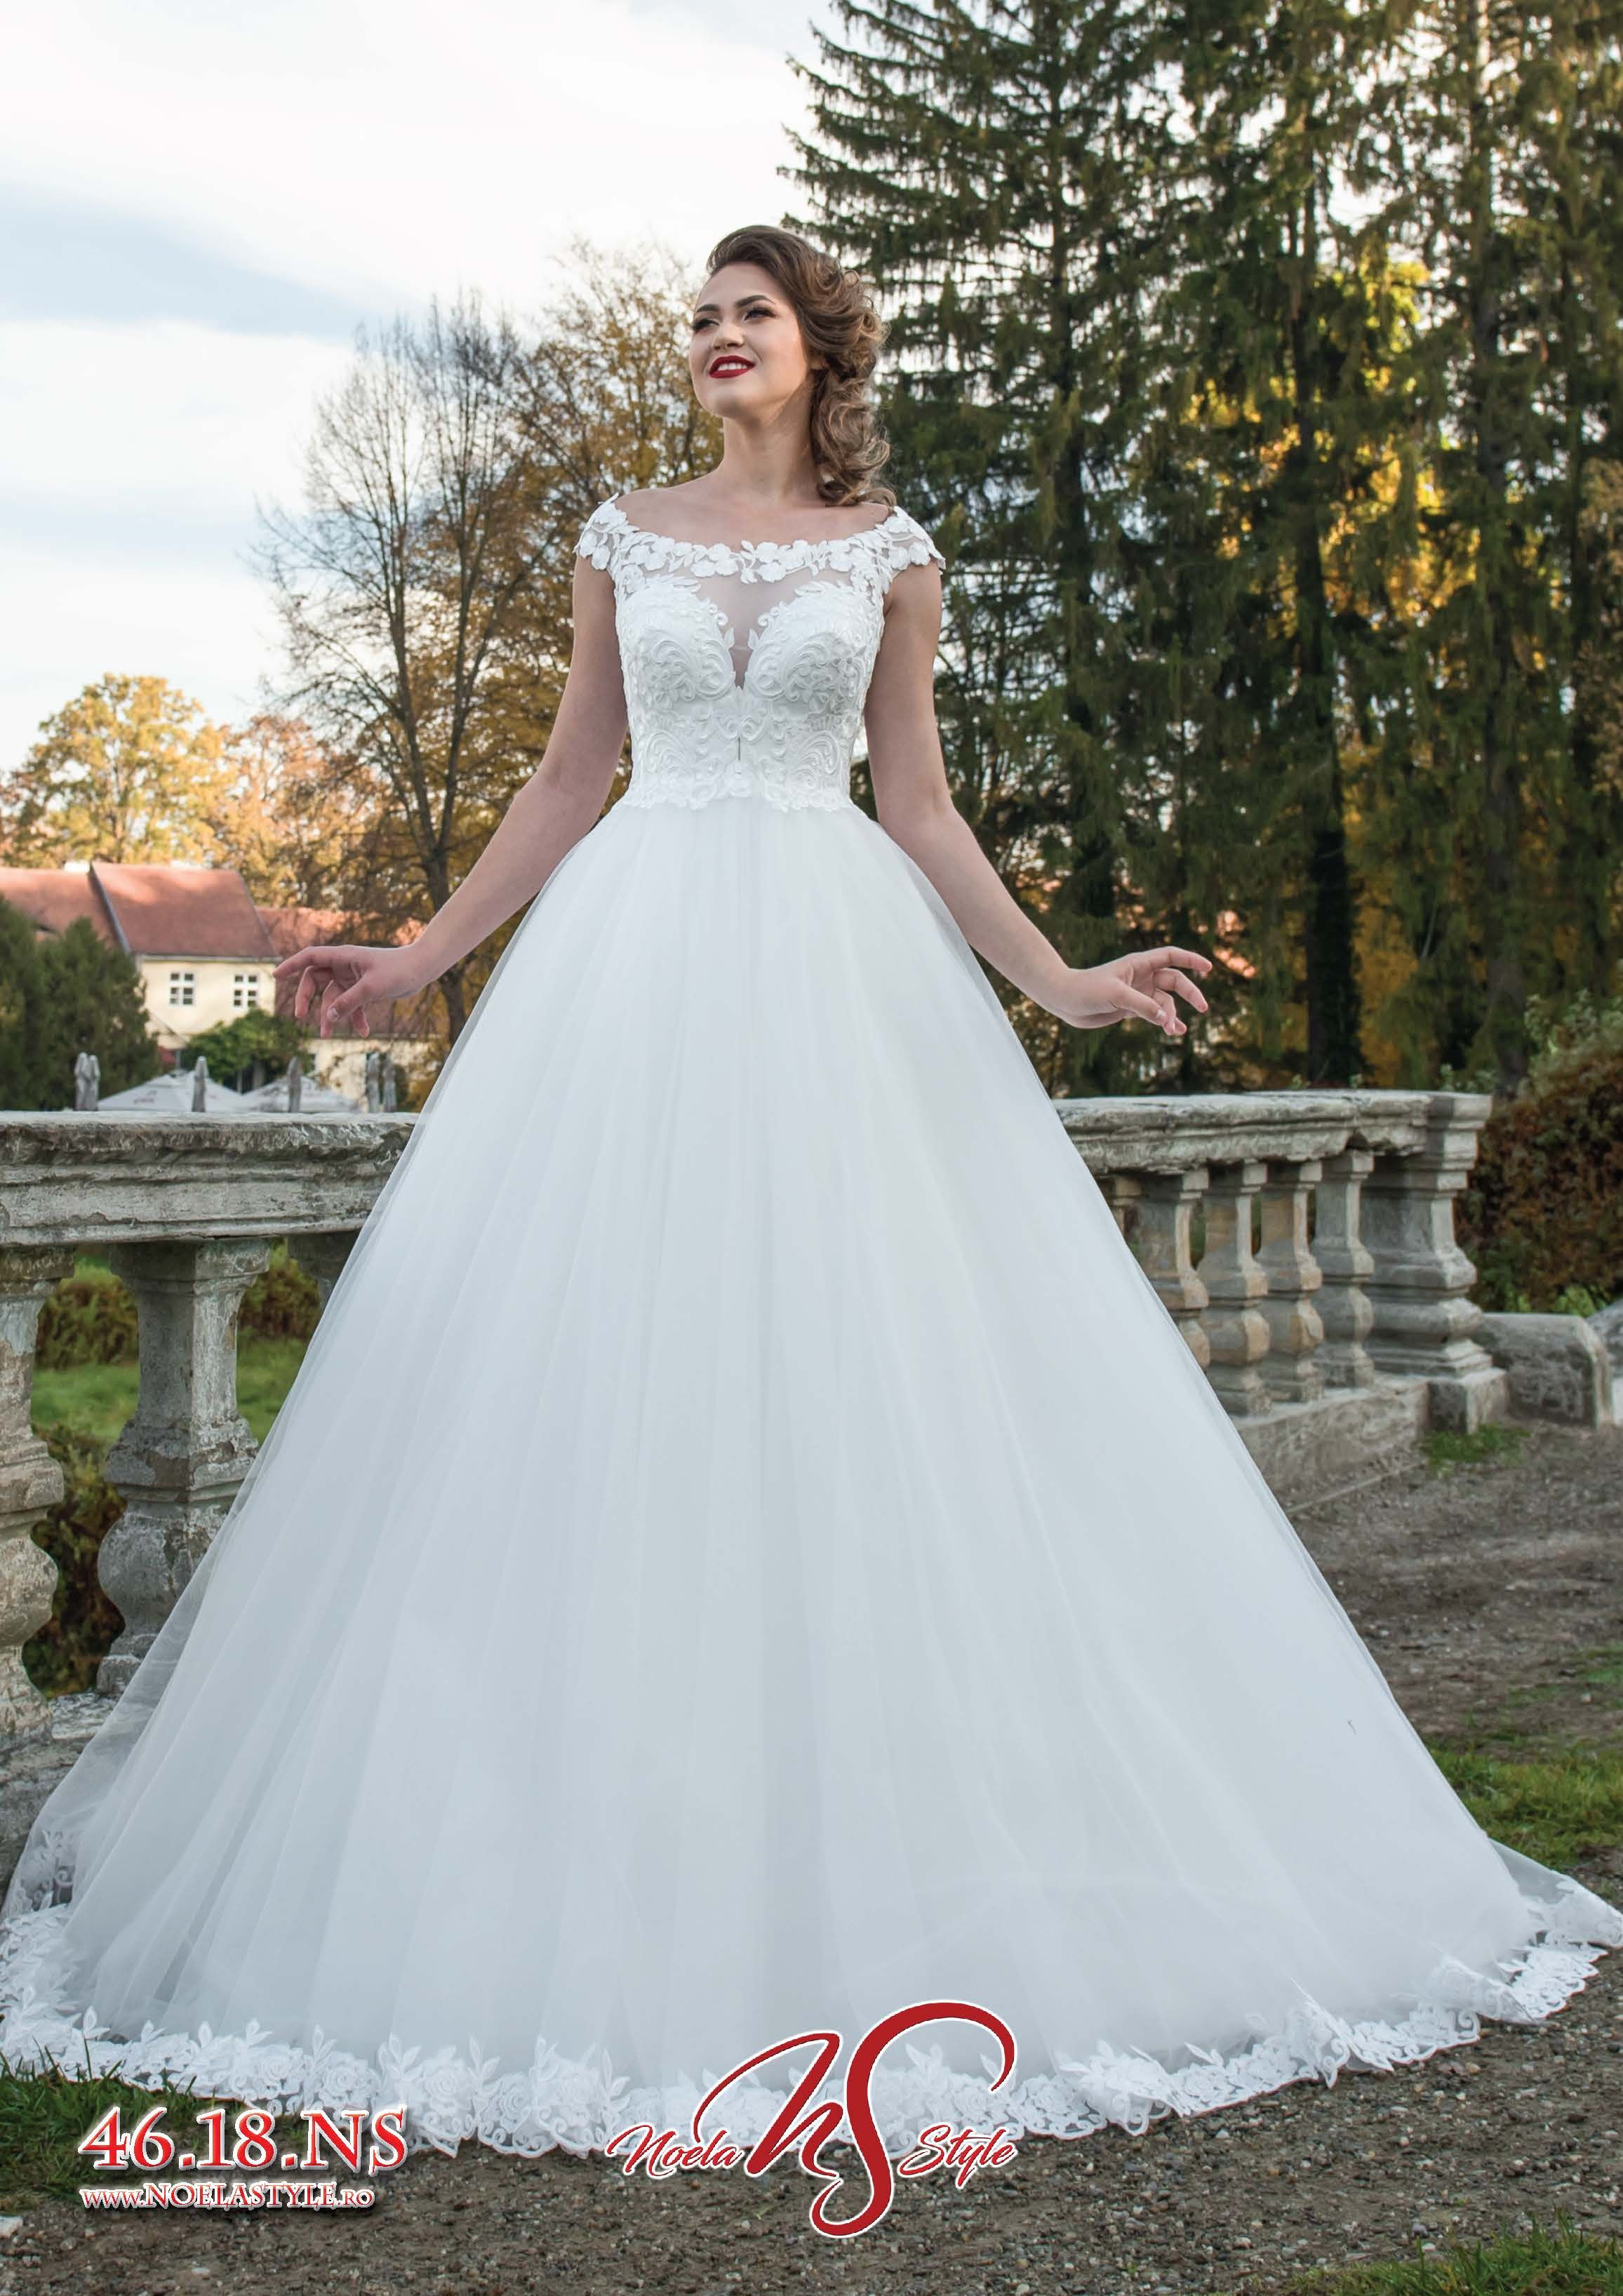 Pin by Darla Harris on weddings   Pinterest   Weddings